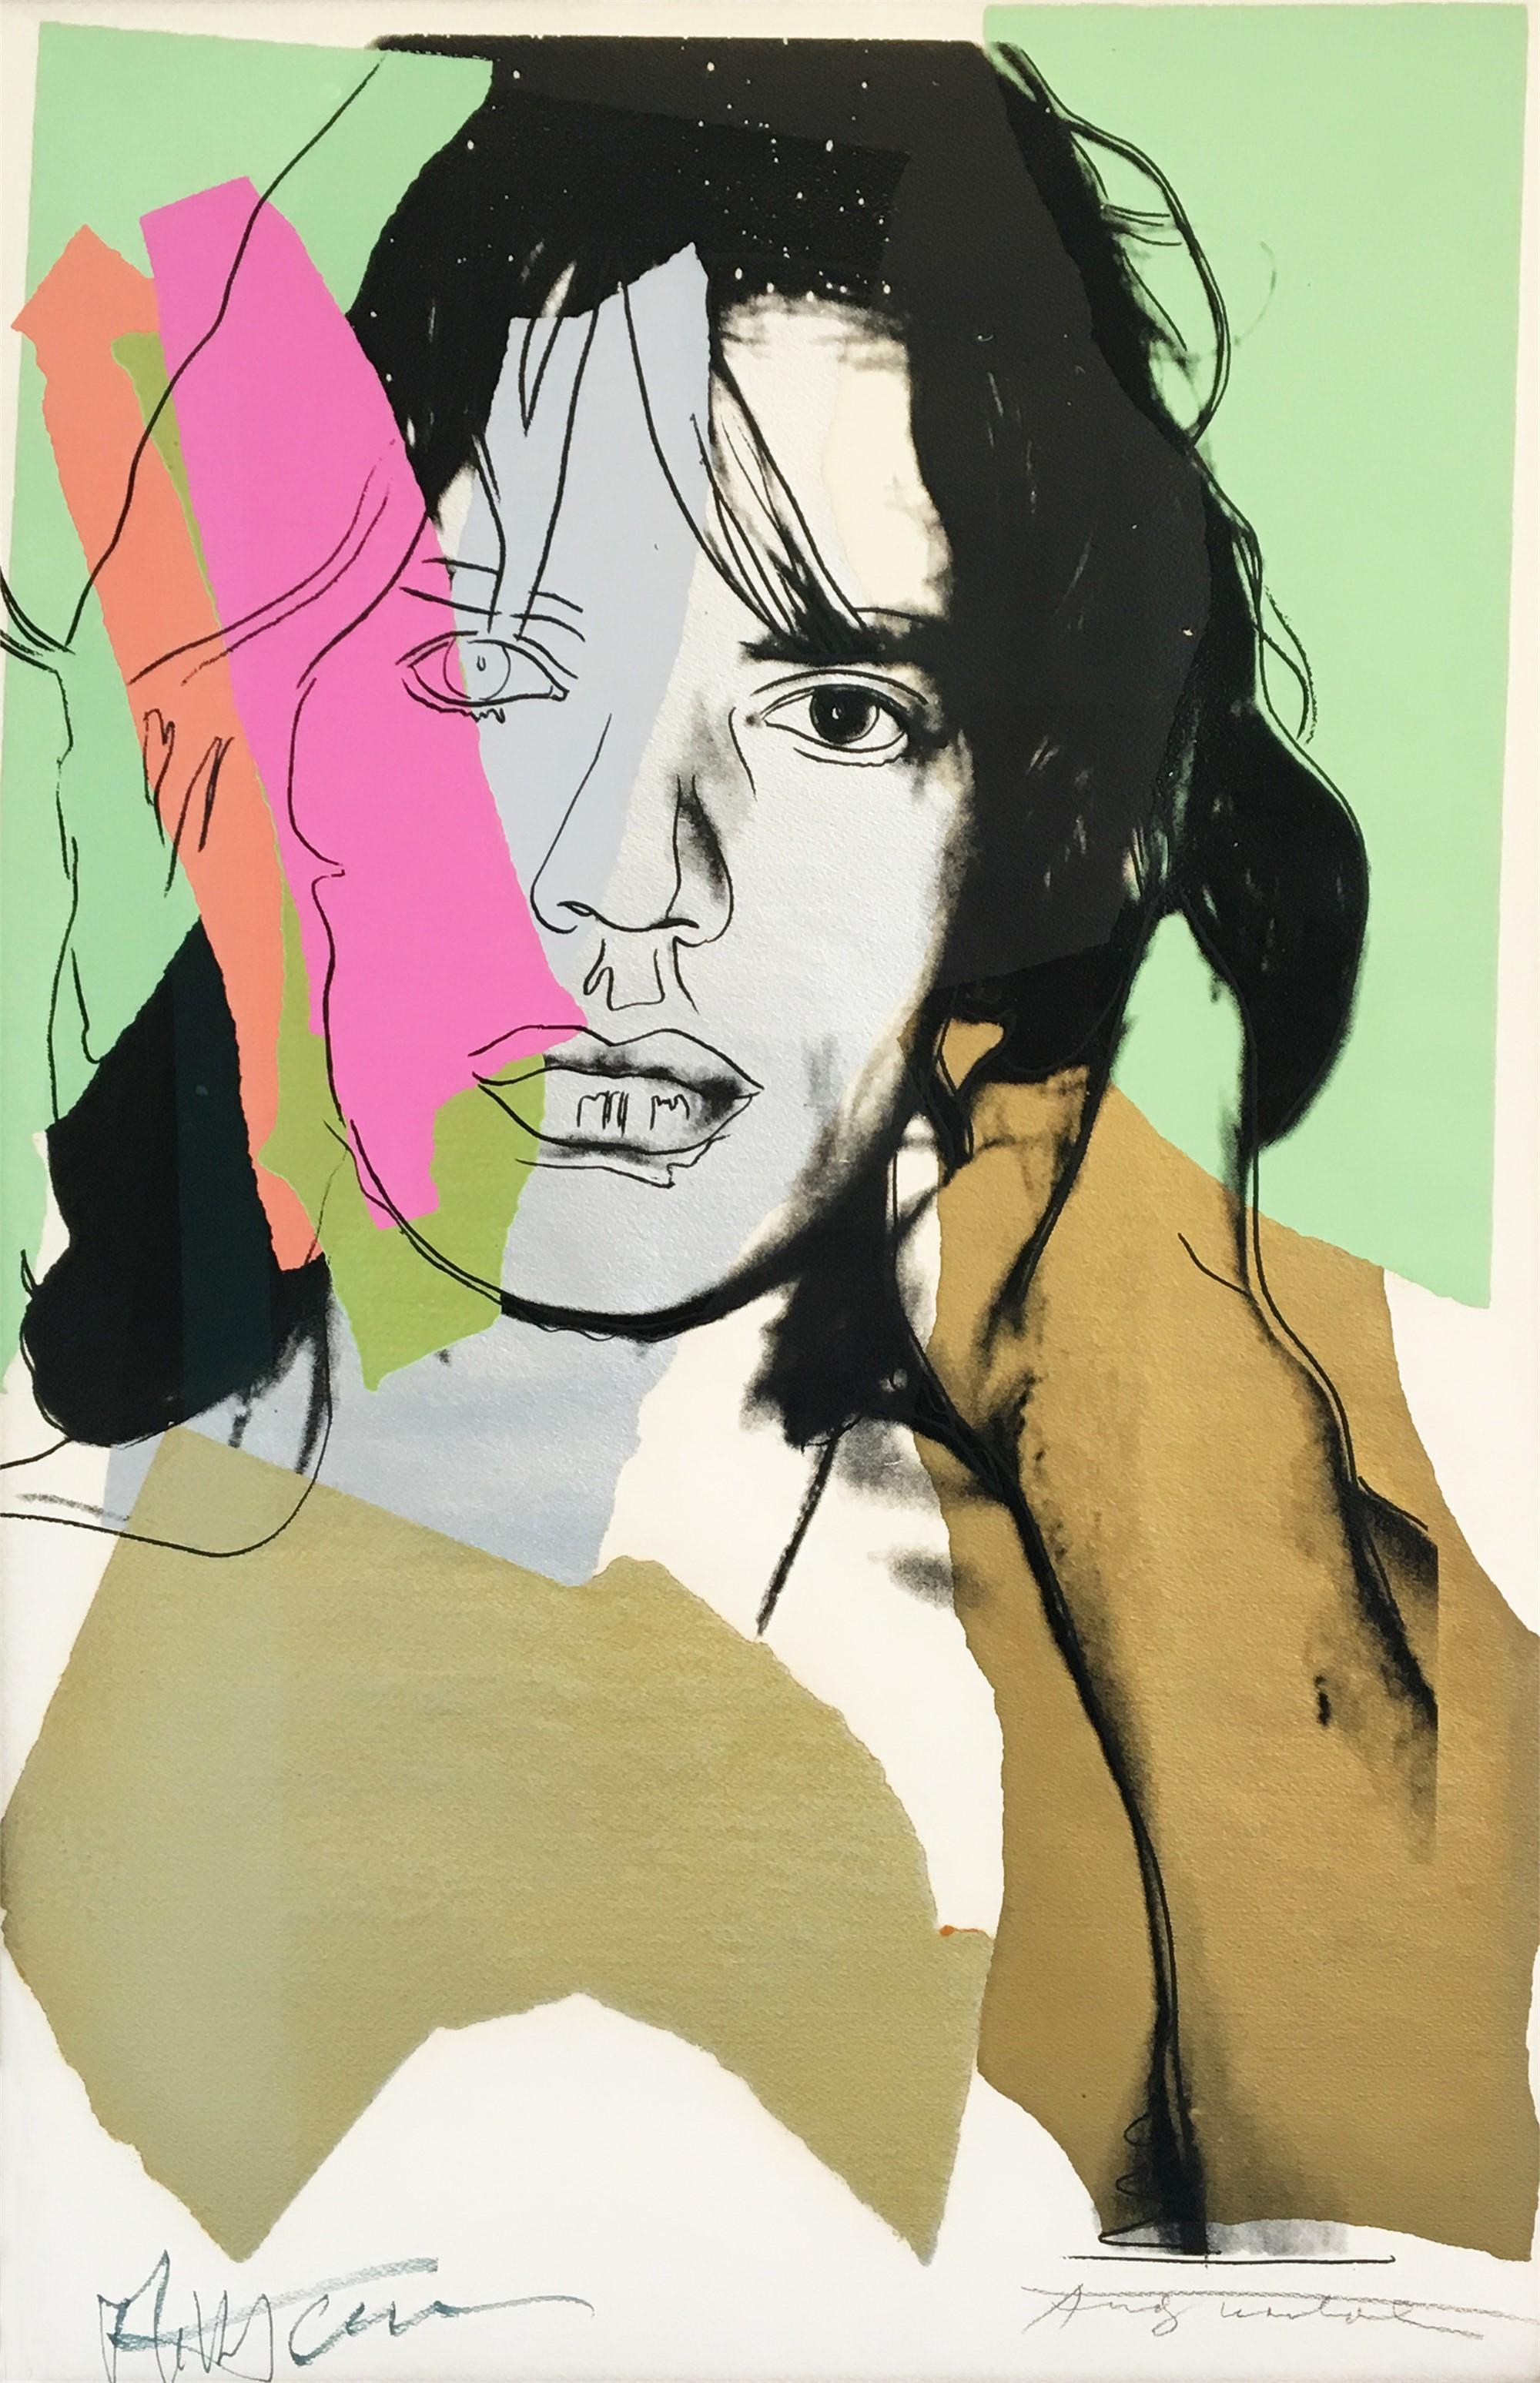 Mick Jagger (F&S II 140) by Andy Warhol